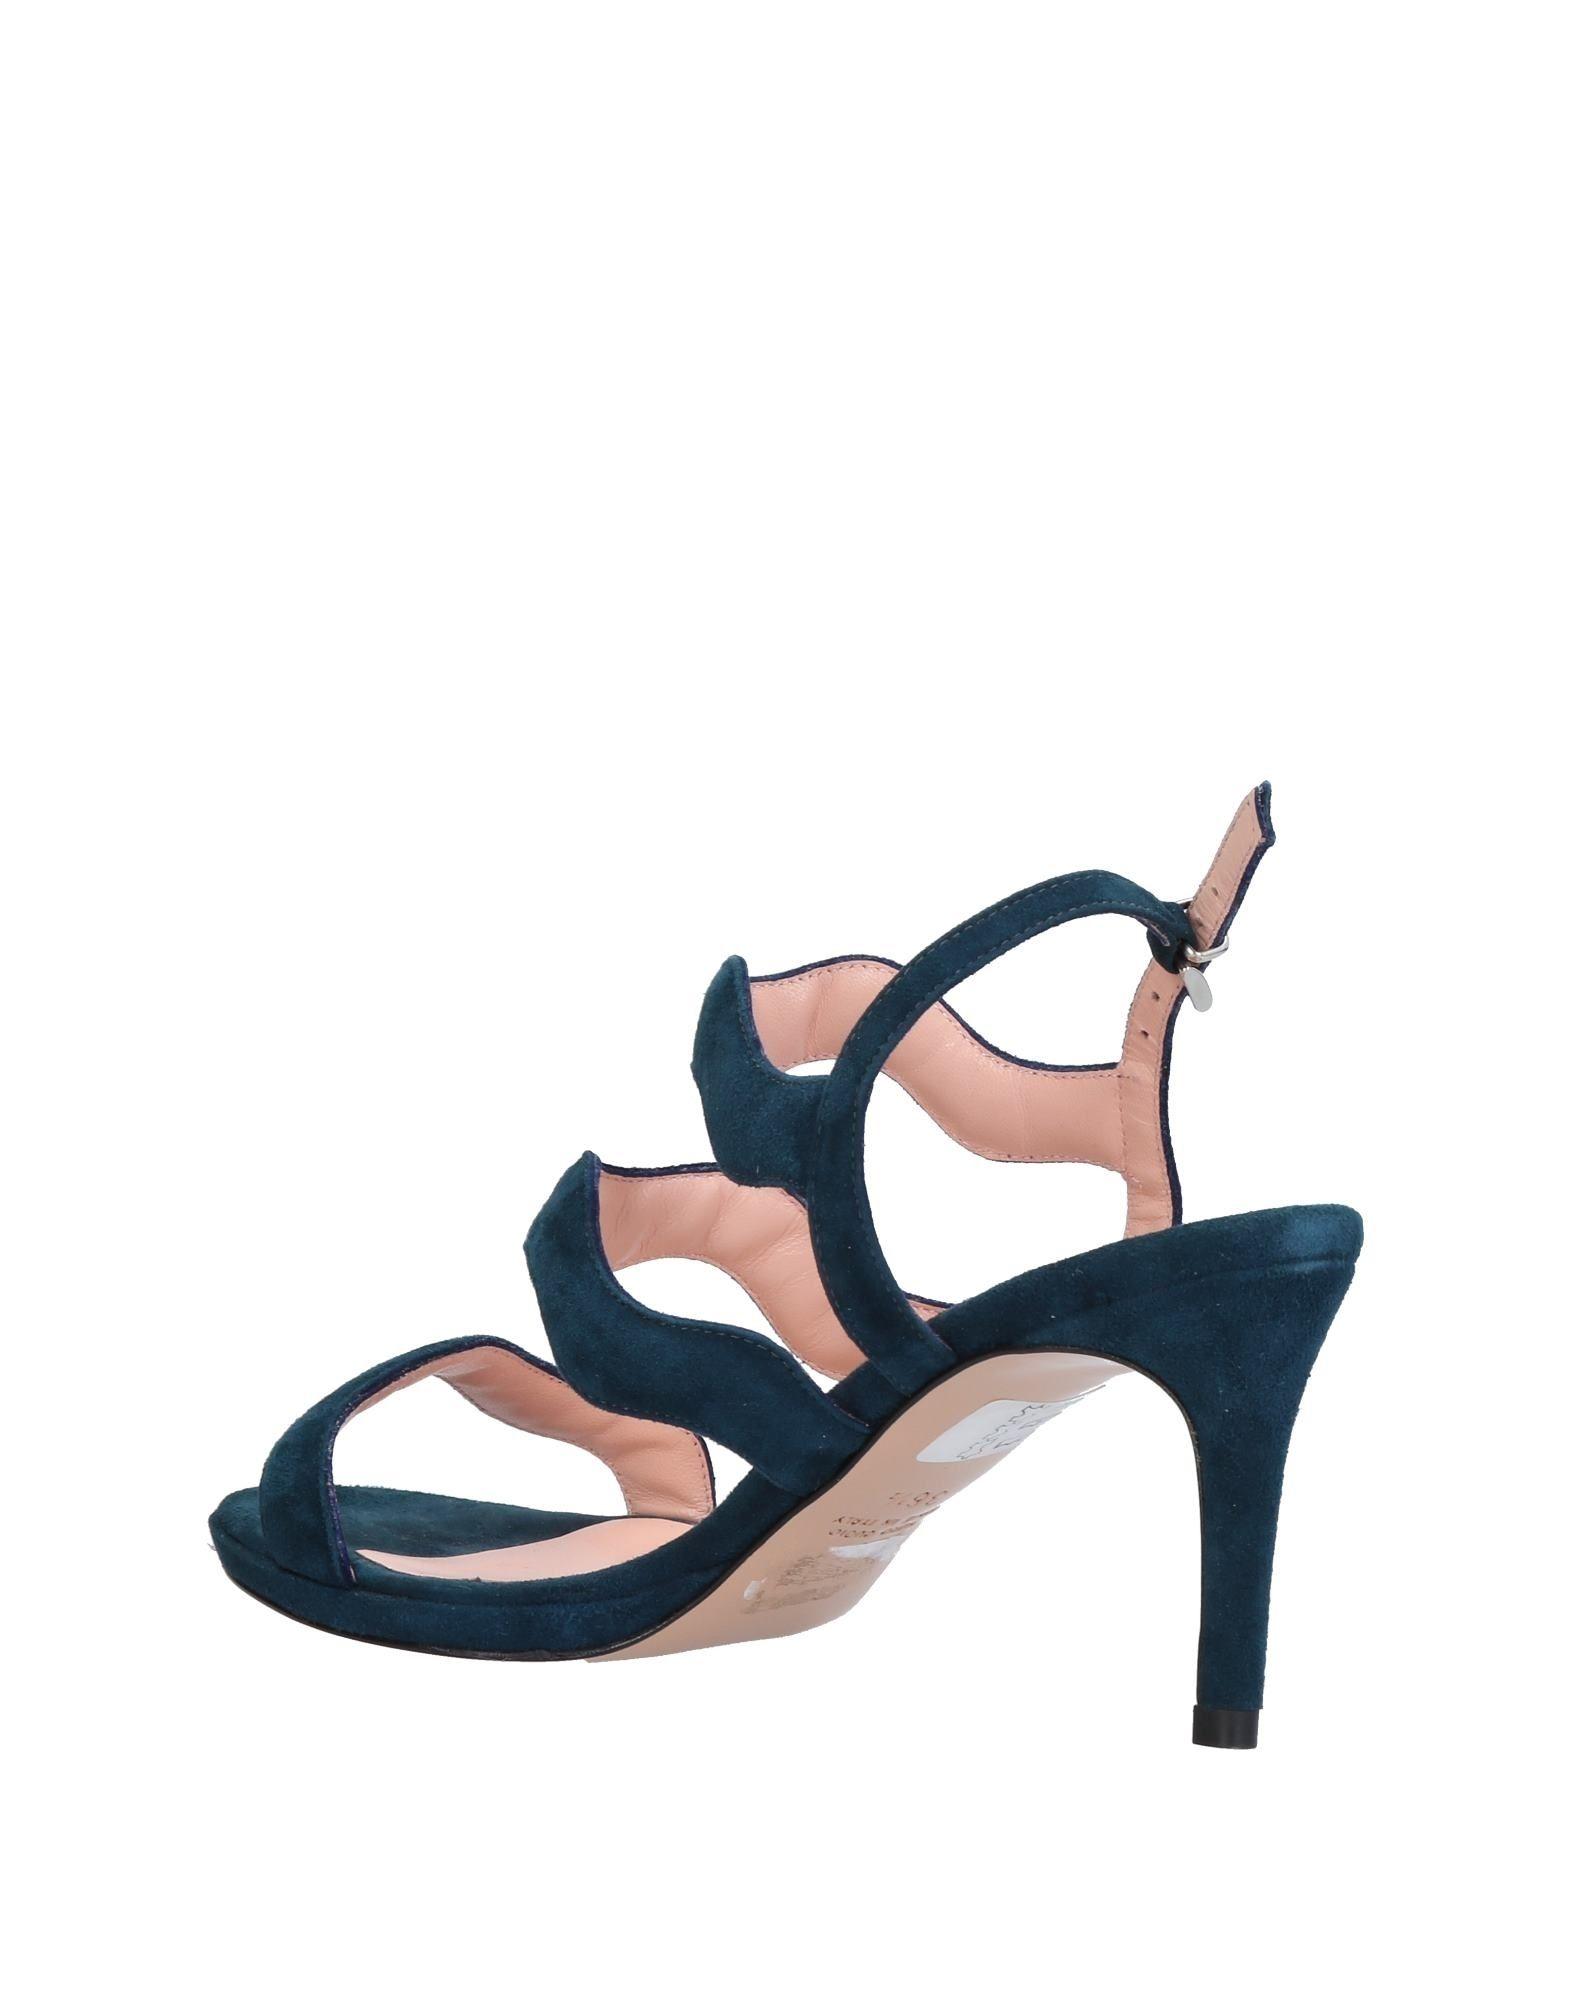 Bruschi Sandalen Damen  11459121CI 11459121CI 11459121CI Gute Qualität beliebte Schuhe c15df7